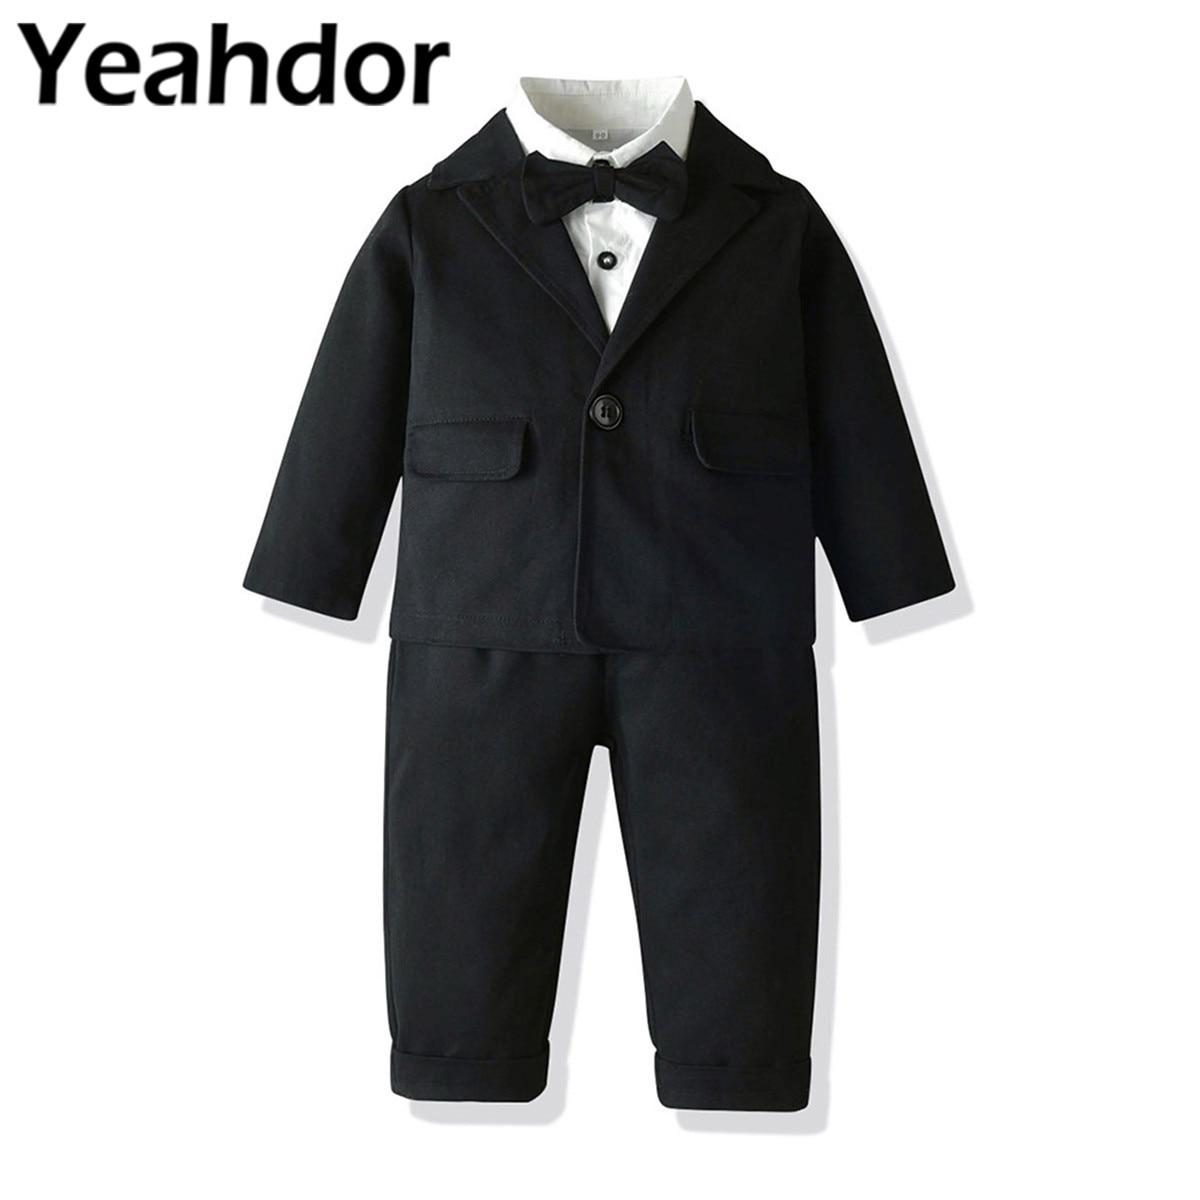 2021 Boys Wedding Suits Bowtie White Shirt + Suspenders Pants Blazer Children's Formal Outfit Boy's Gentleman Costume Dress Suit